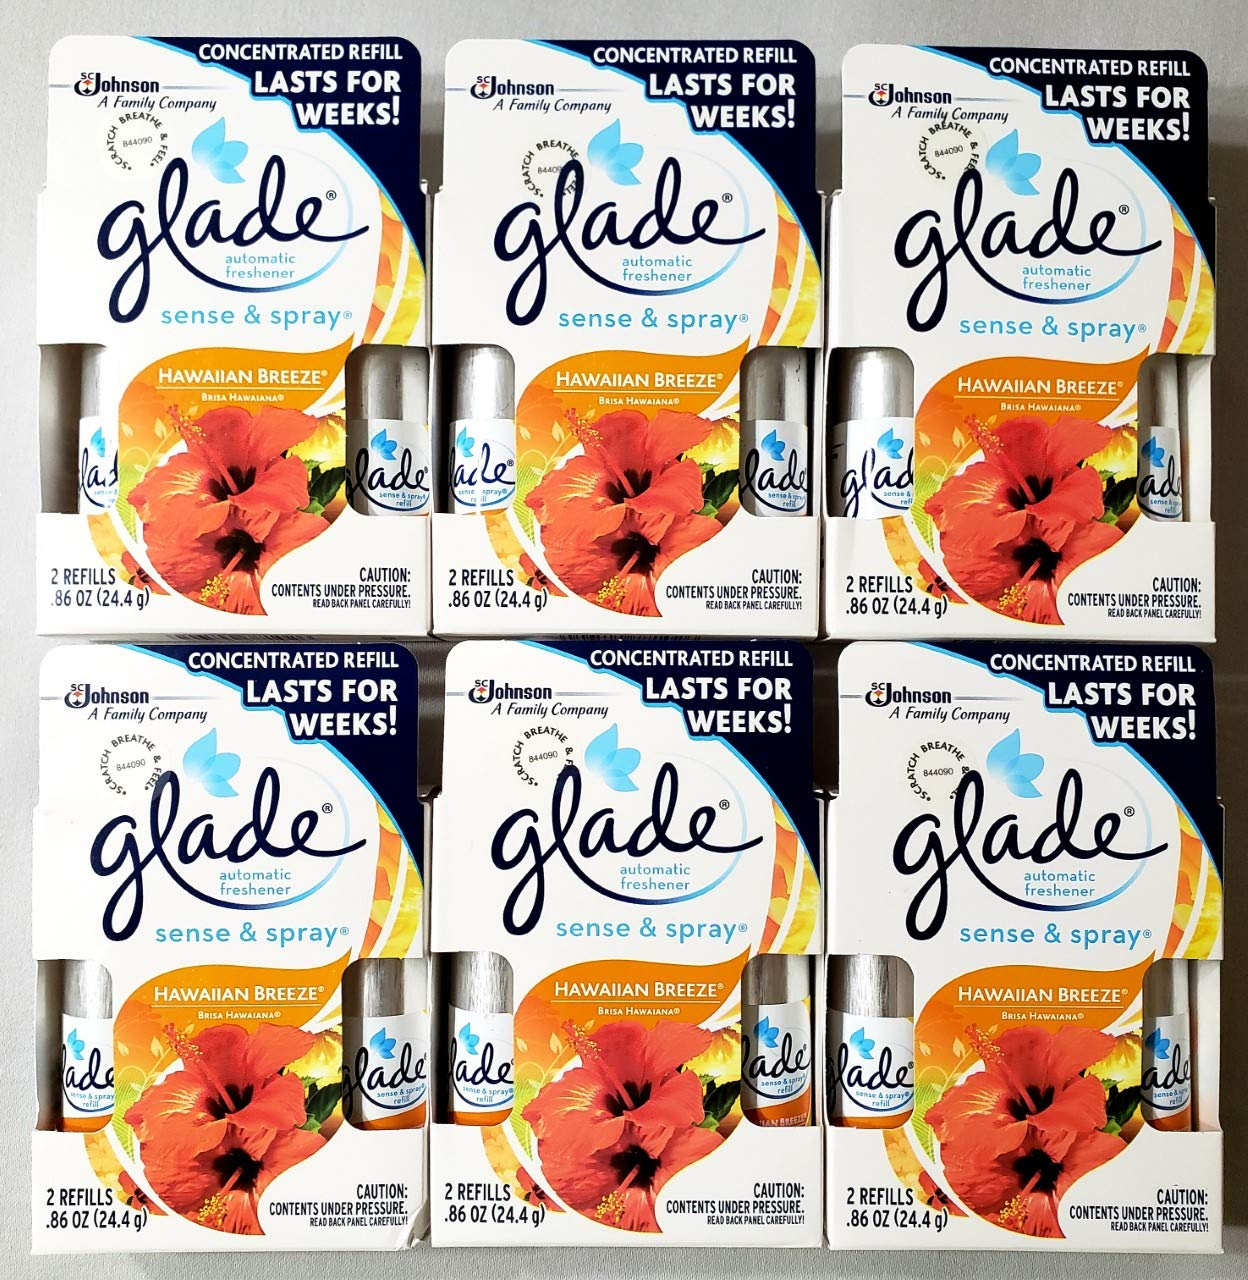 12 Glade Sense & Spray Automatic Refills, Hawaiian Breeze (6 Twin Packs) in Box